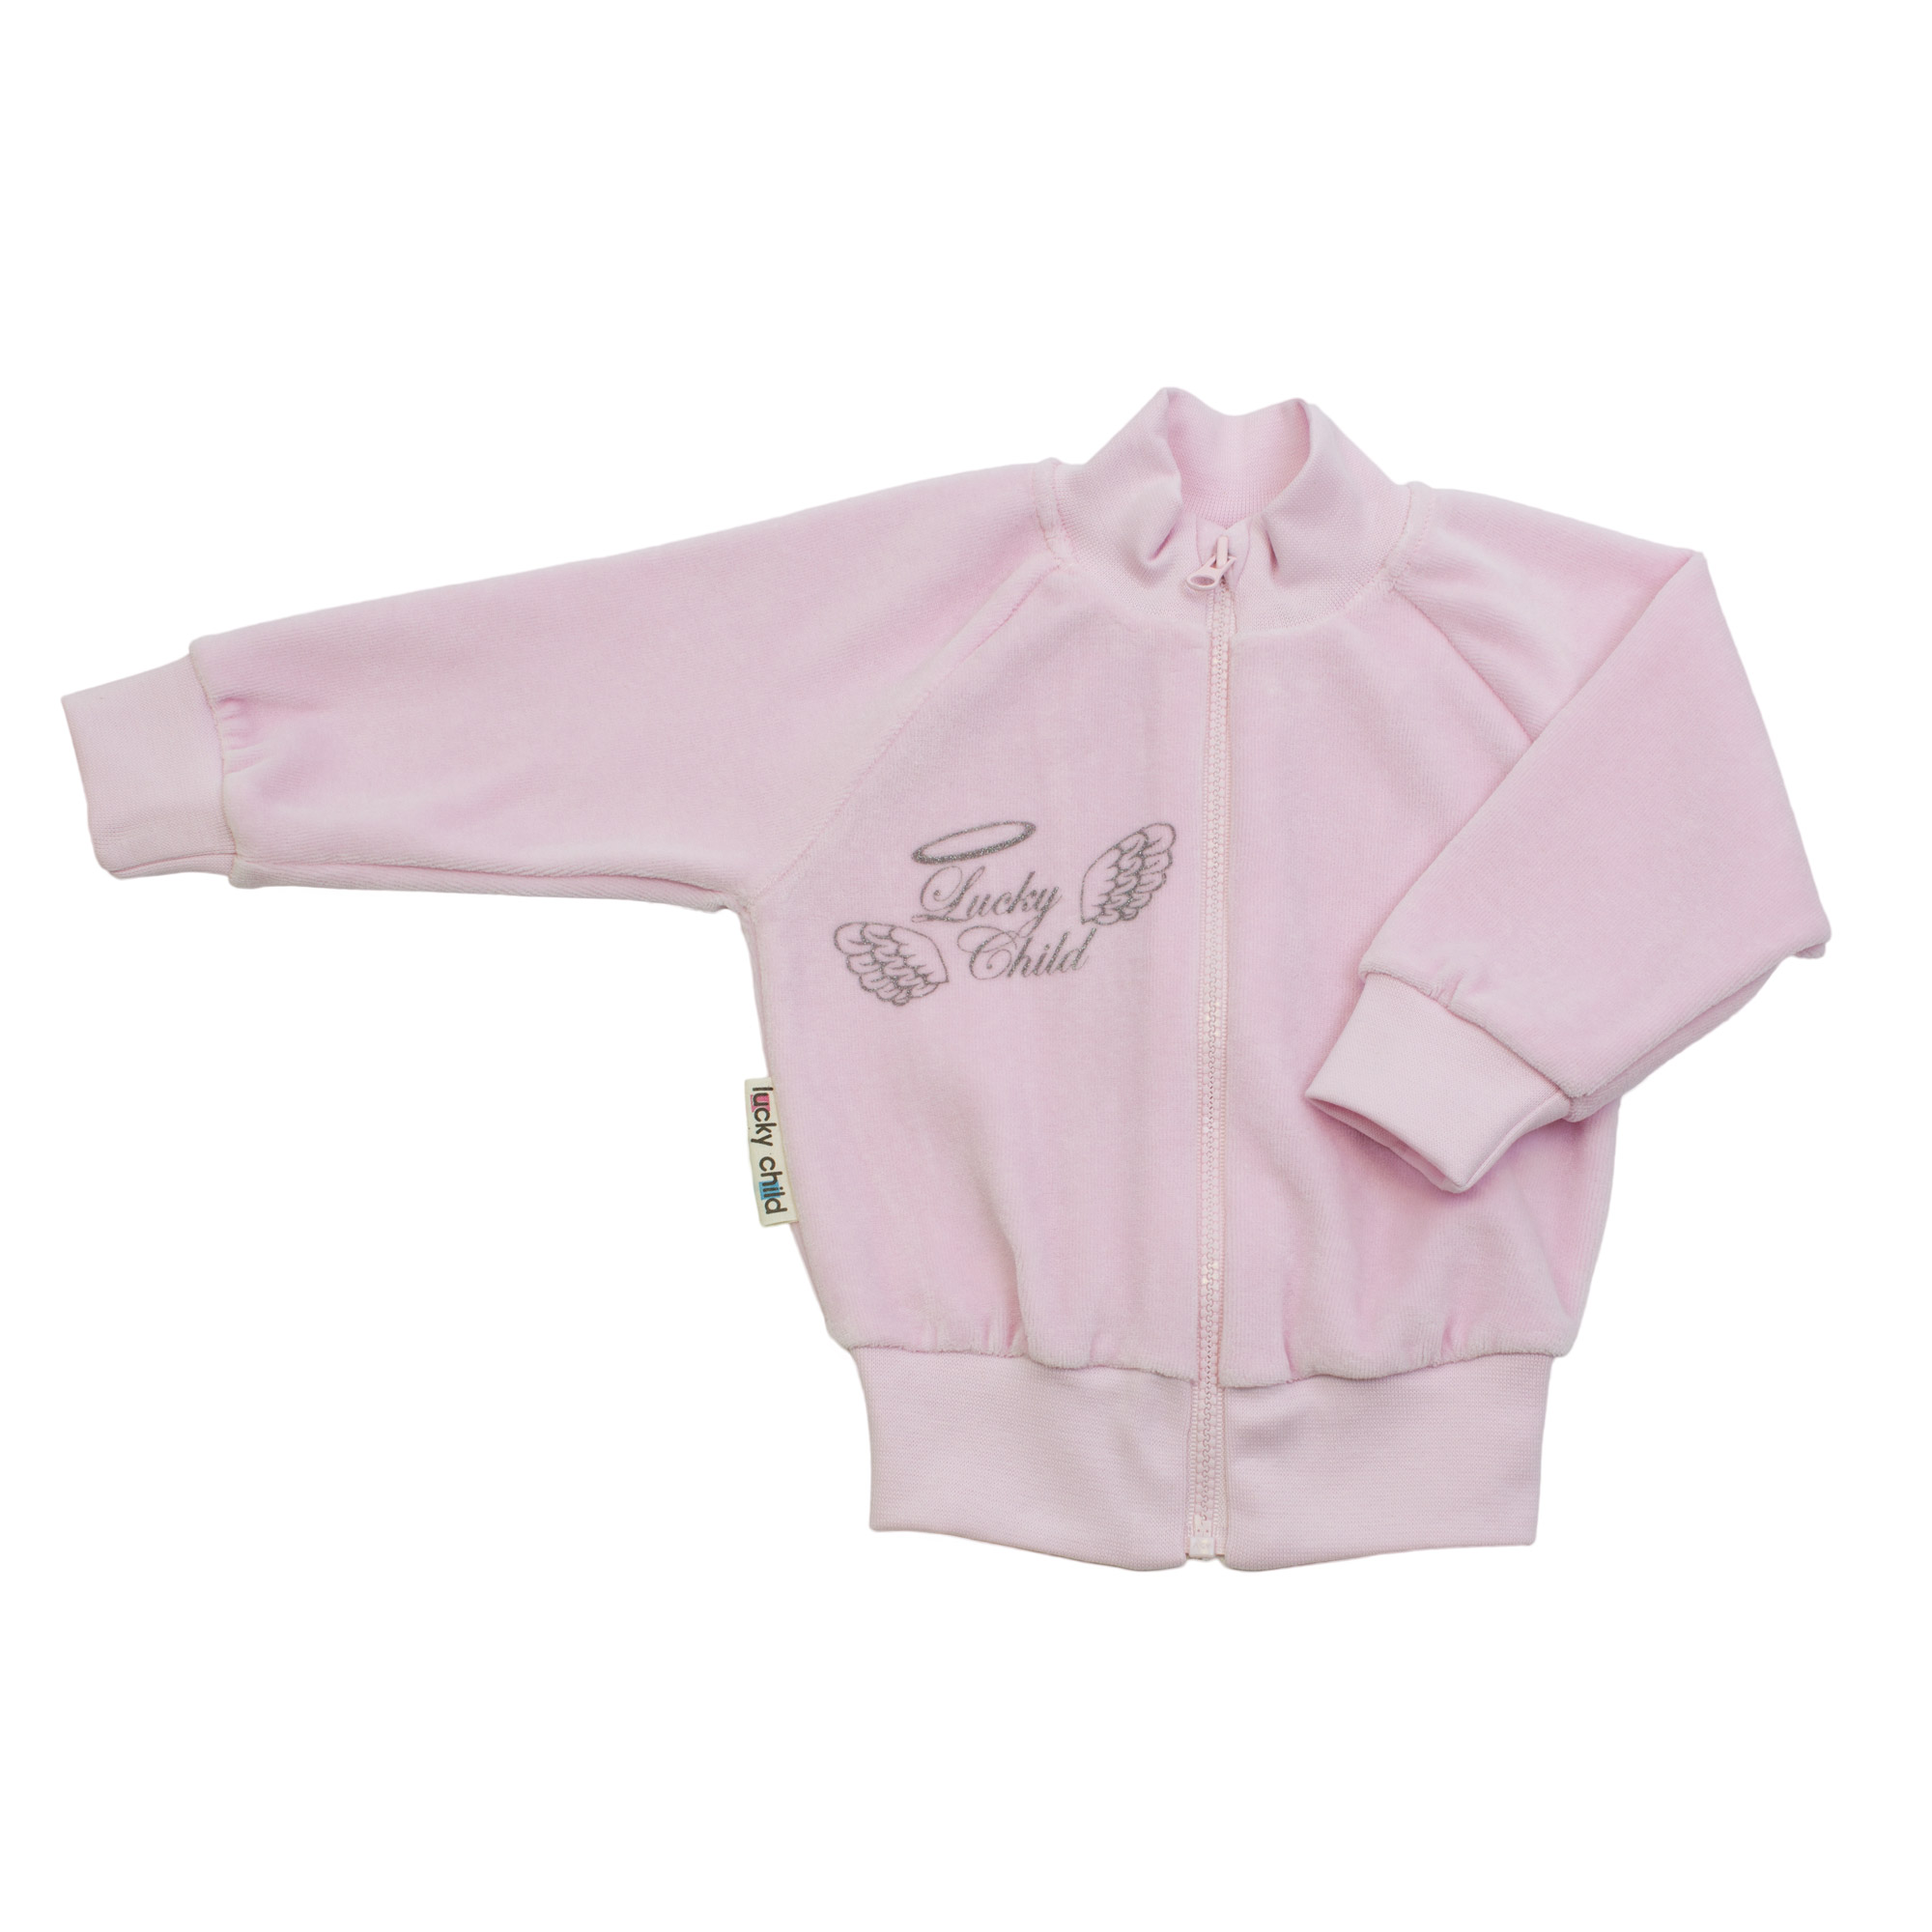 Кофточка Lucky Child из велюра Ангелочки розовая 74-80